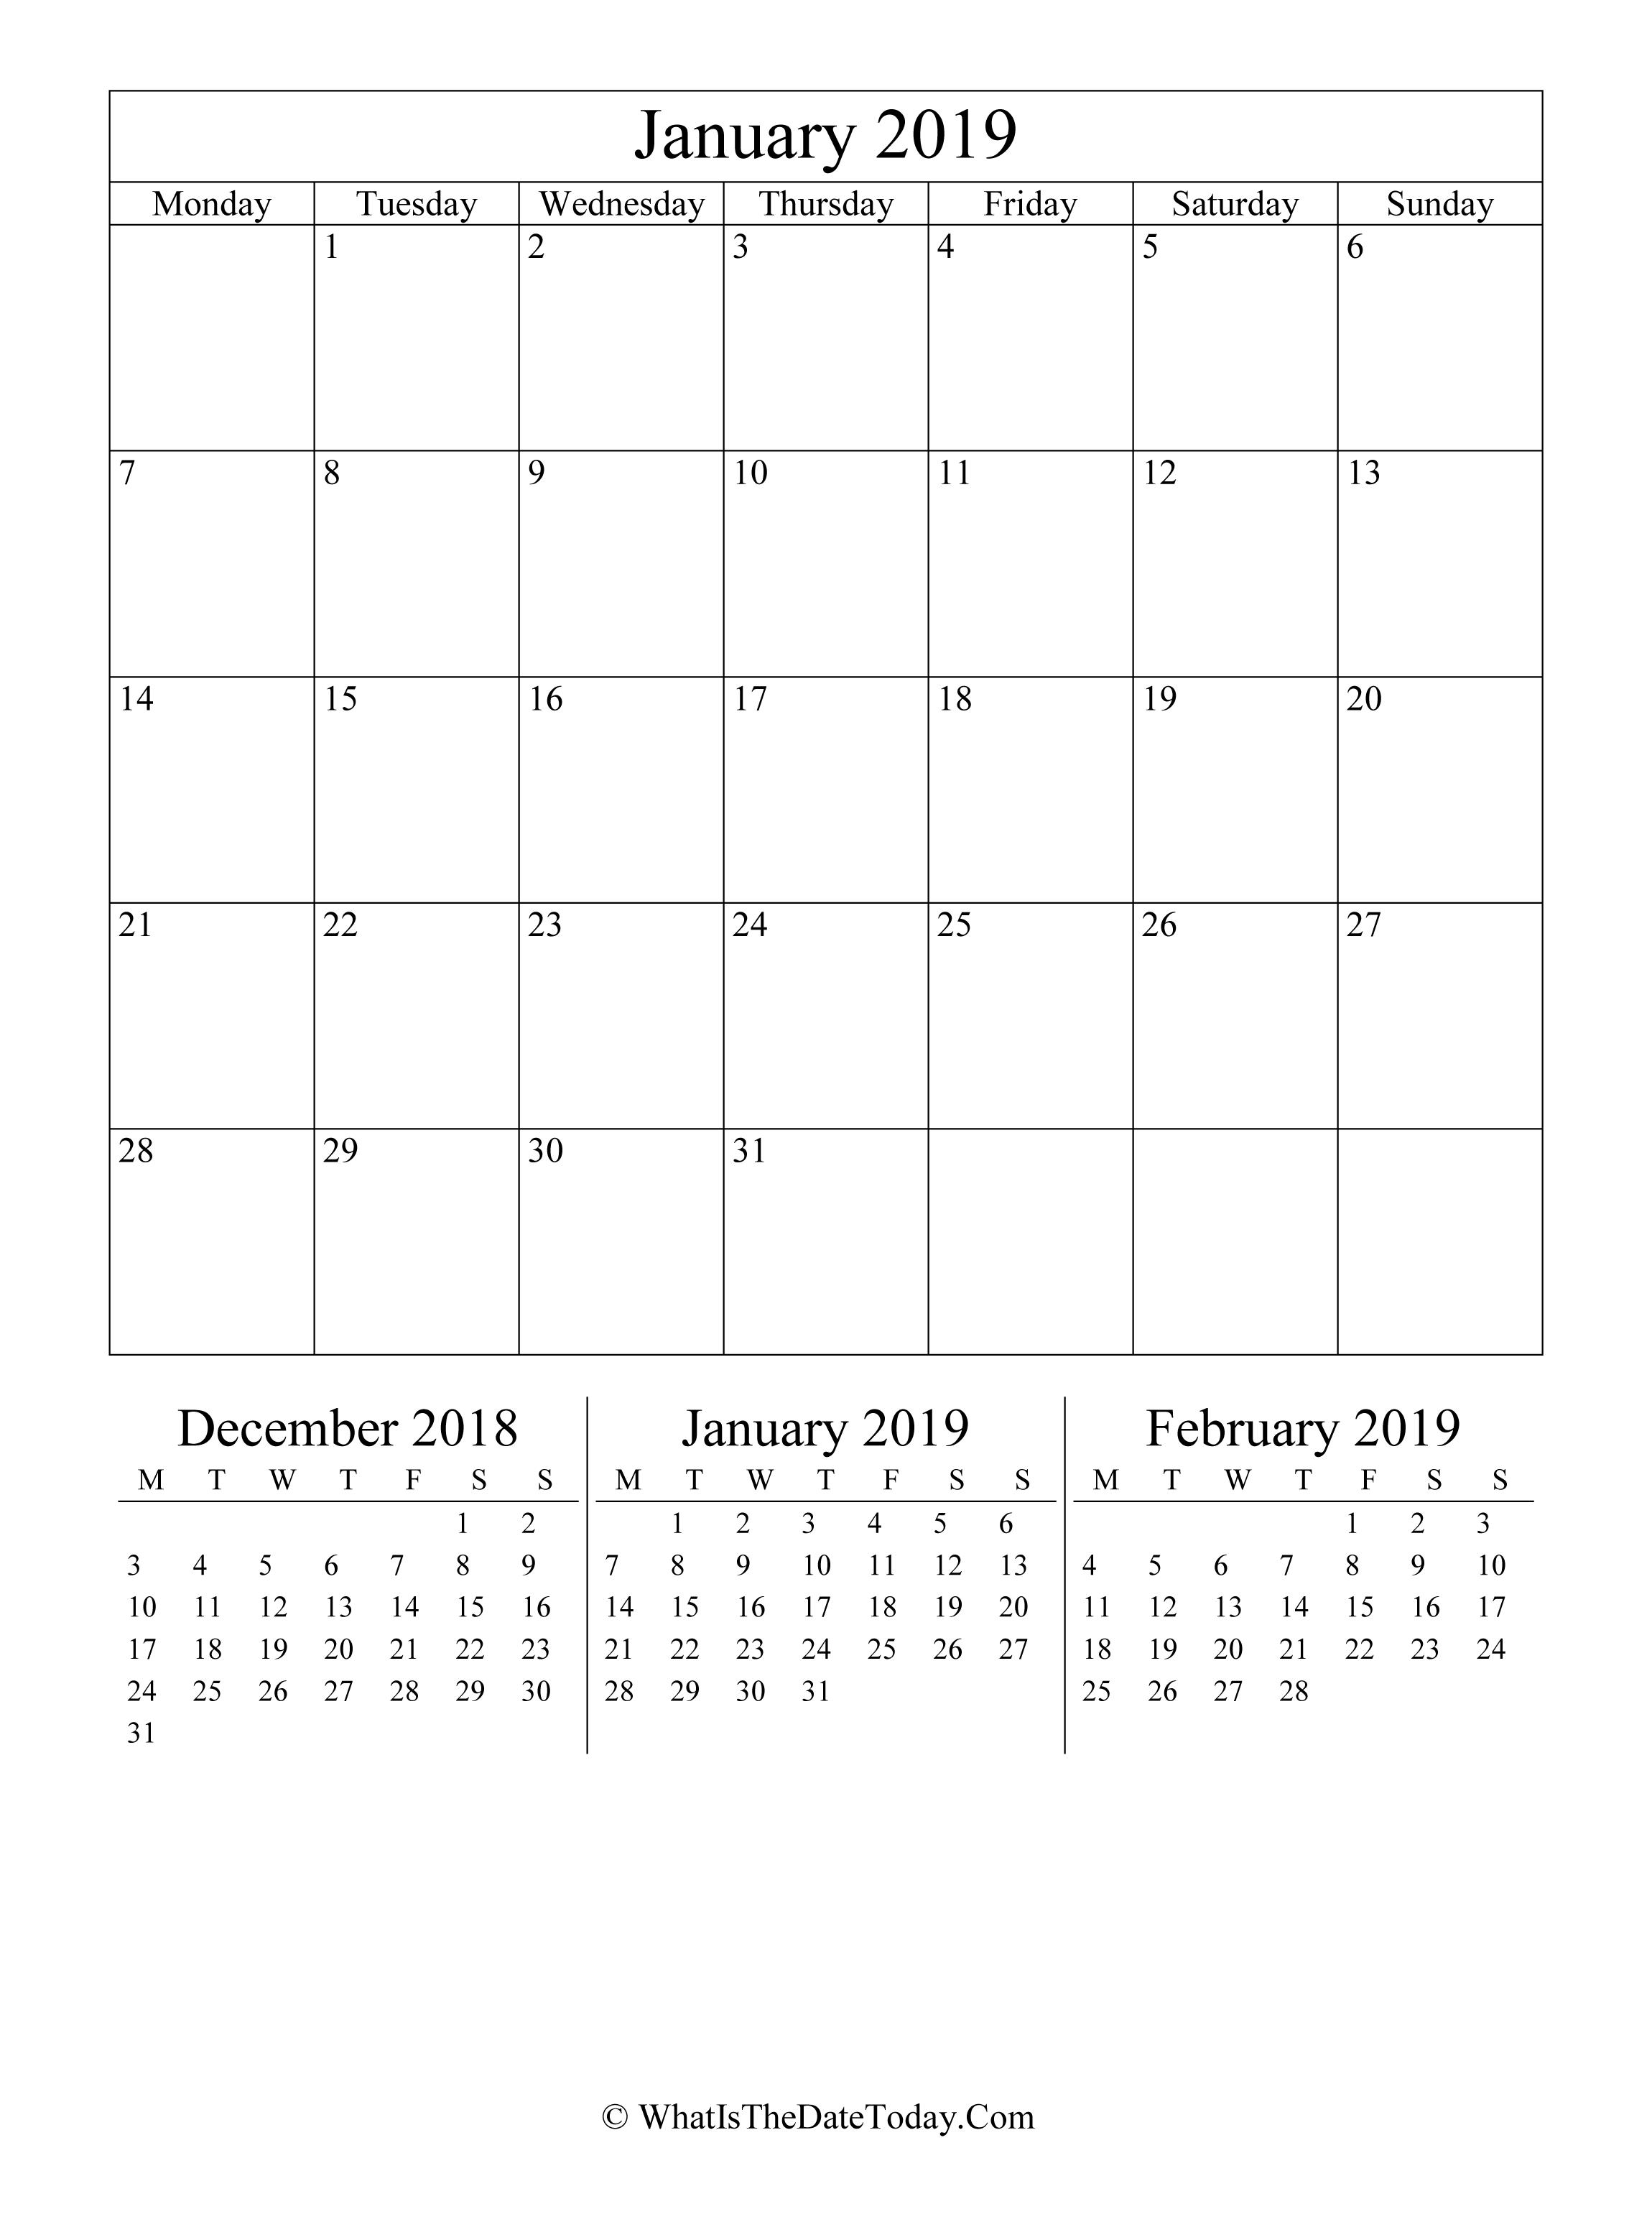 January Vertical Calendar 2019 January 2019 Editable Calendar (vertical layout